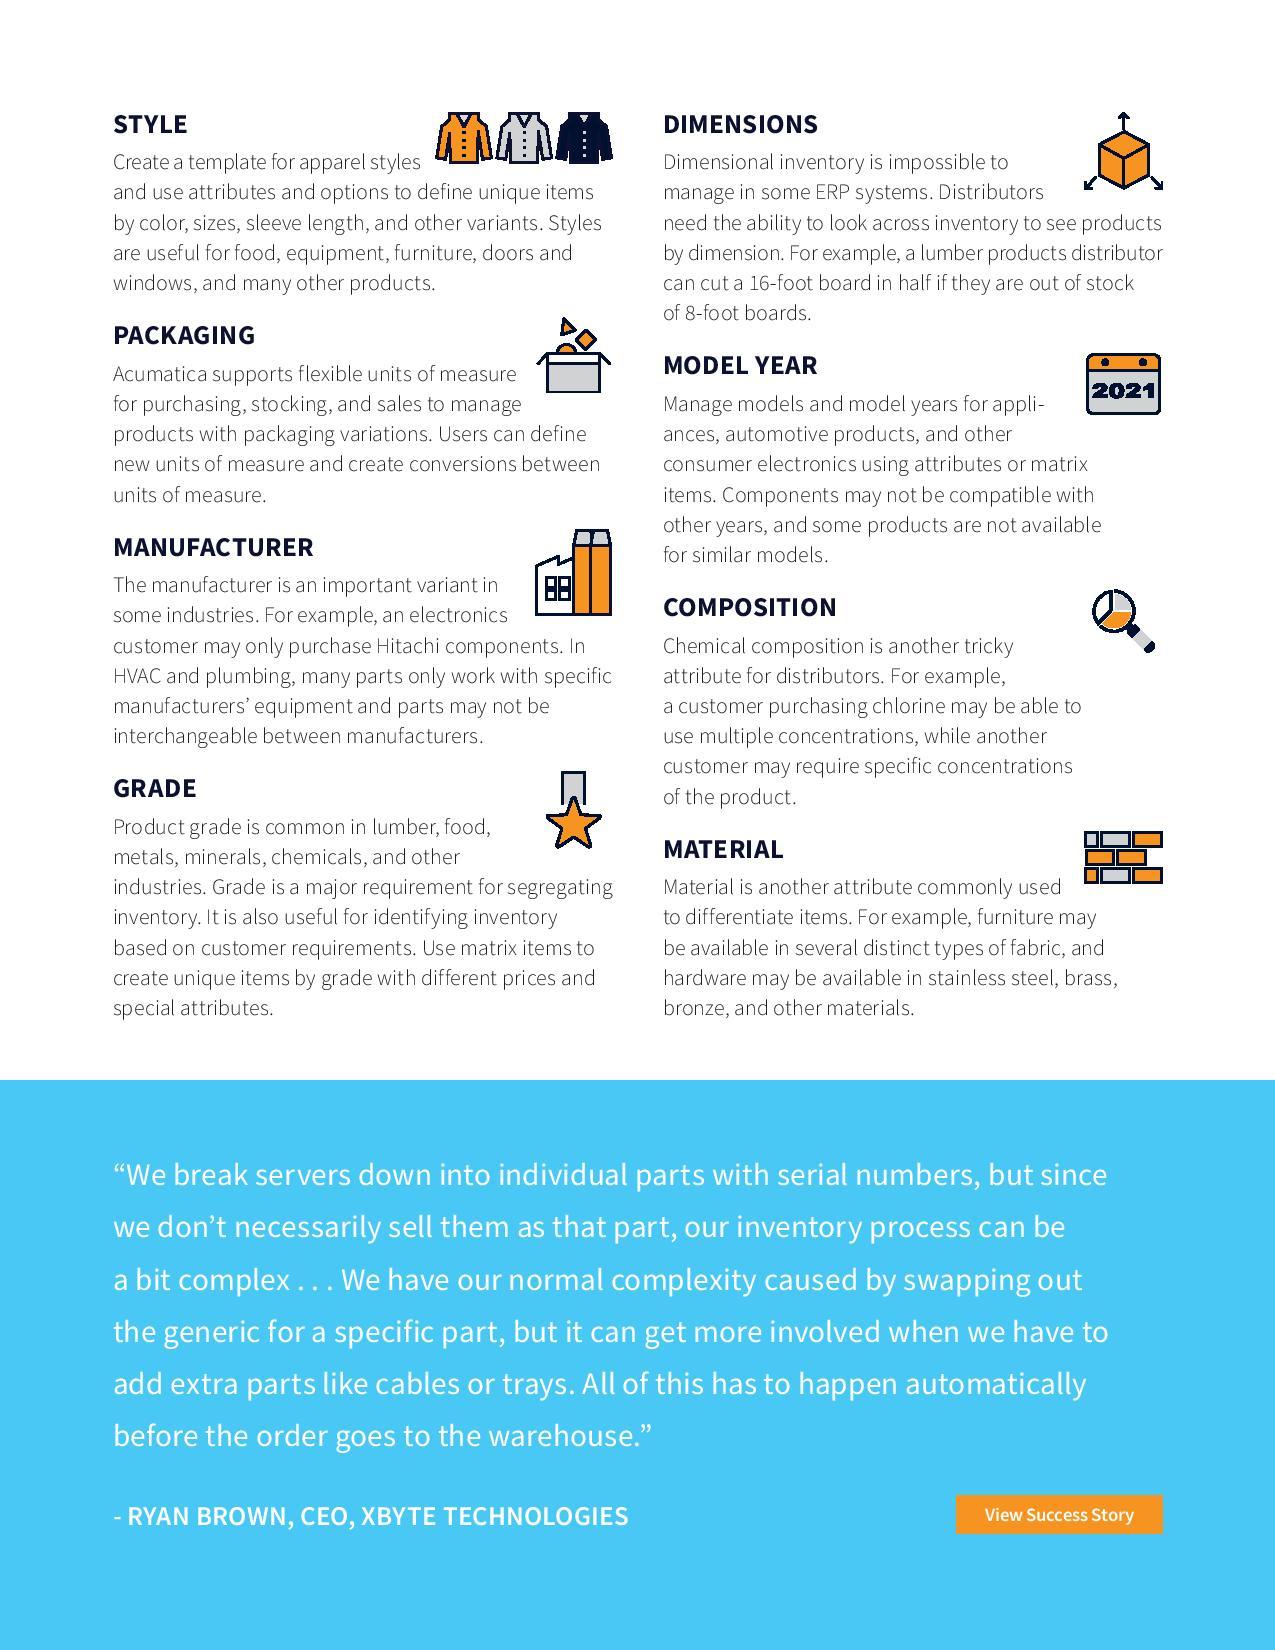 Faster, Easier Item Management for Distributors, page 2